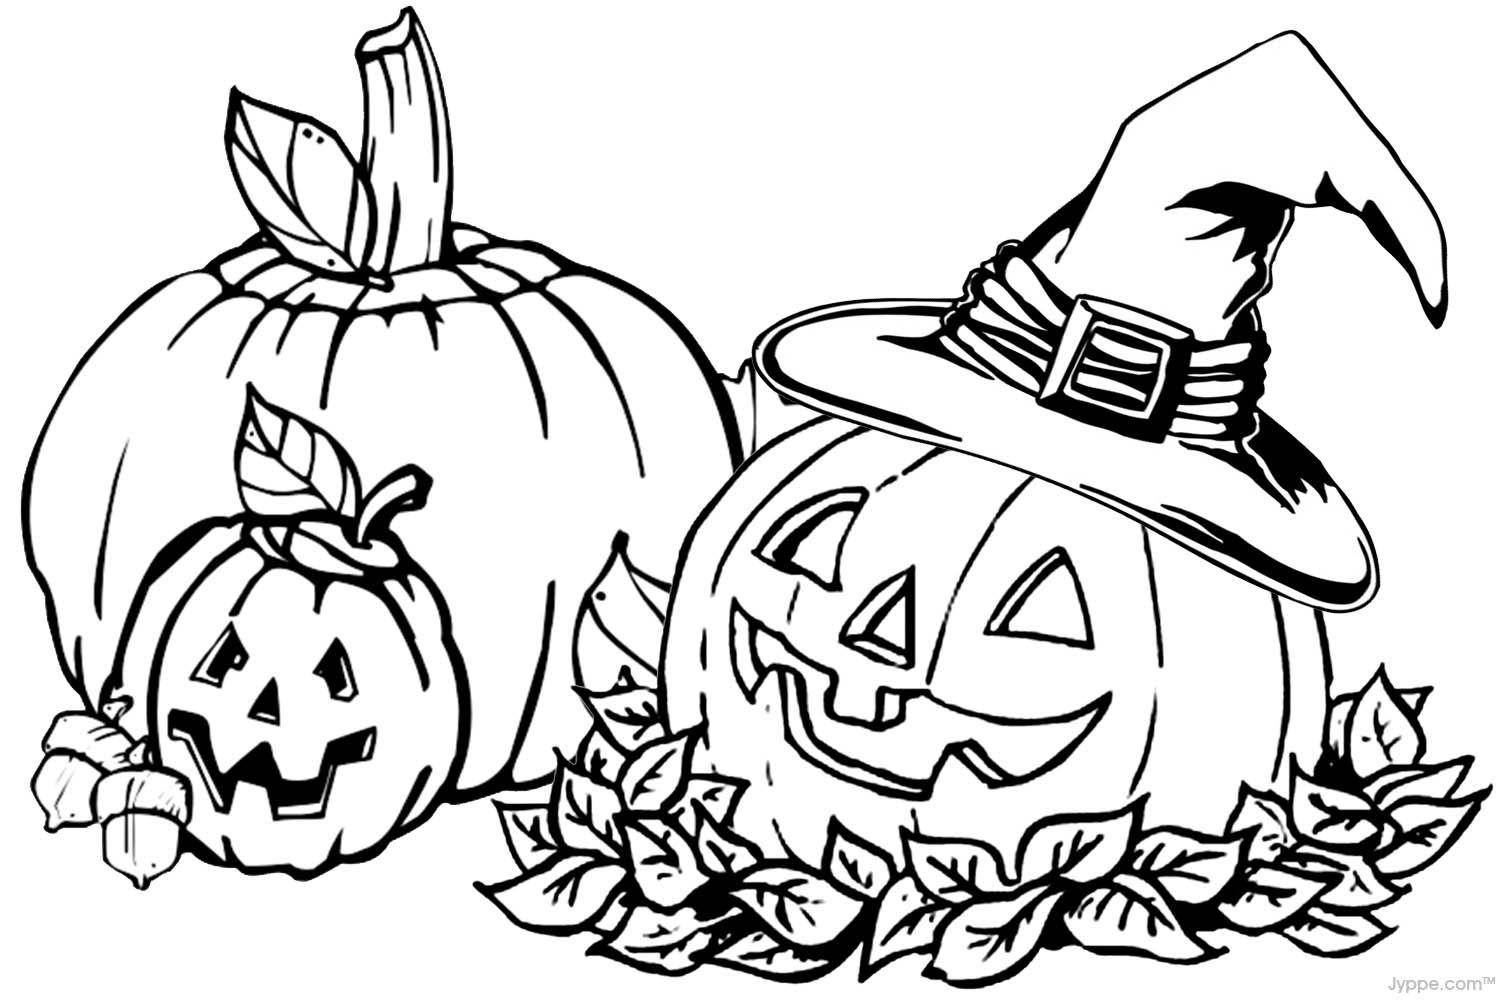 Pumpkin Coloring Pages (1503 x 1000) | Halloween (B&W) - Clip Art ...